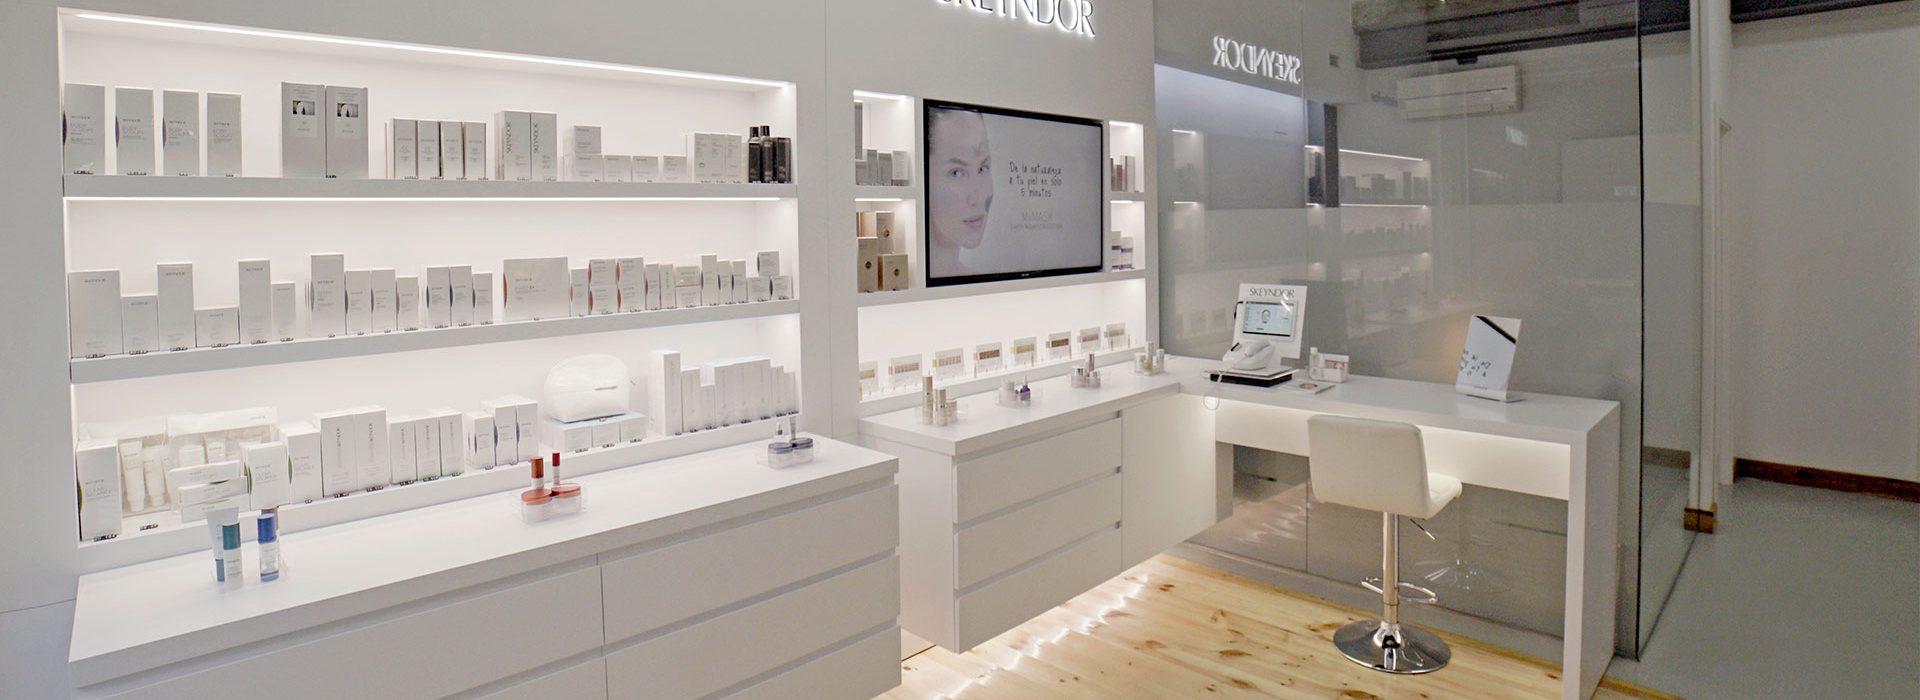 Unika Salon